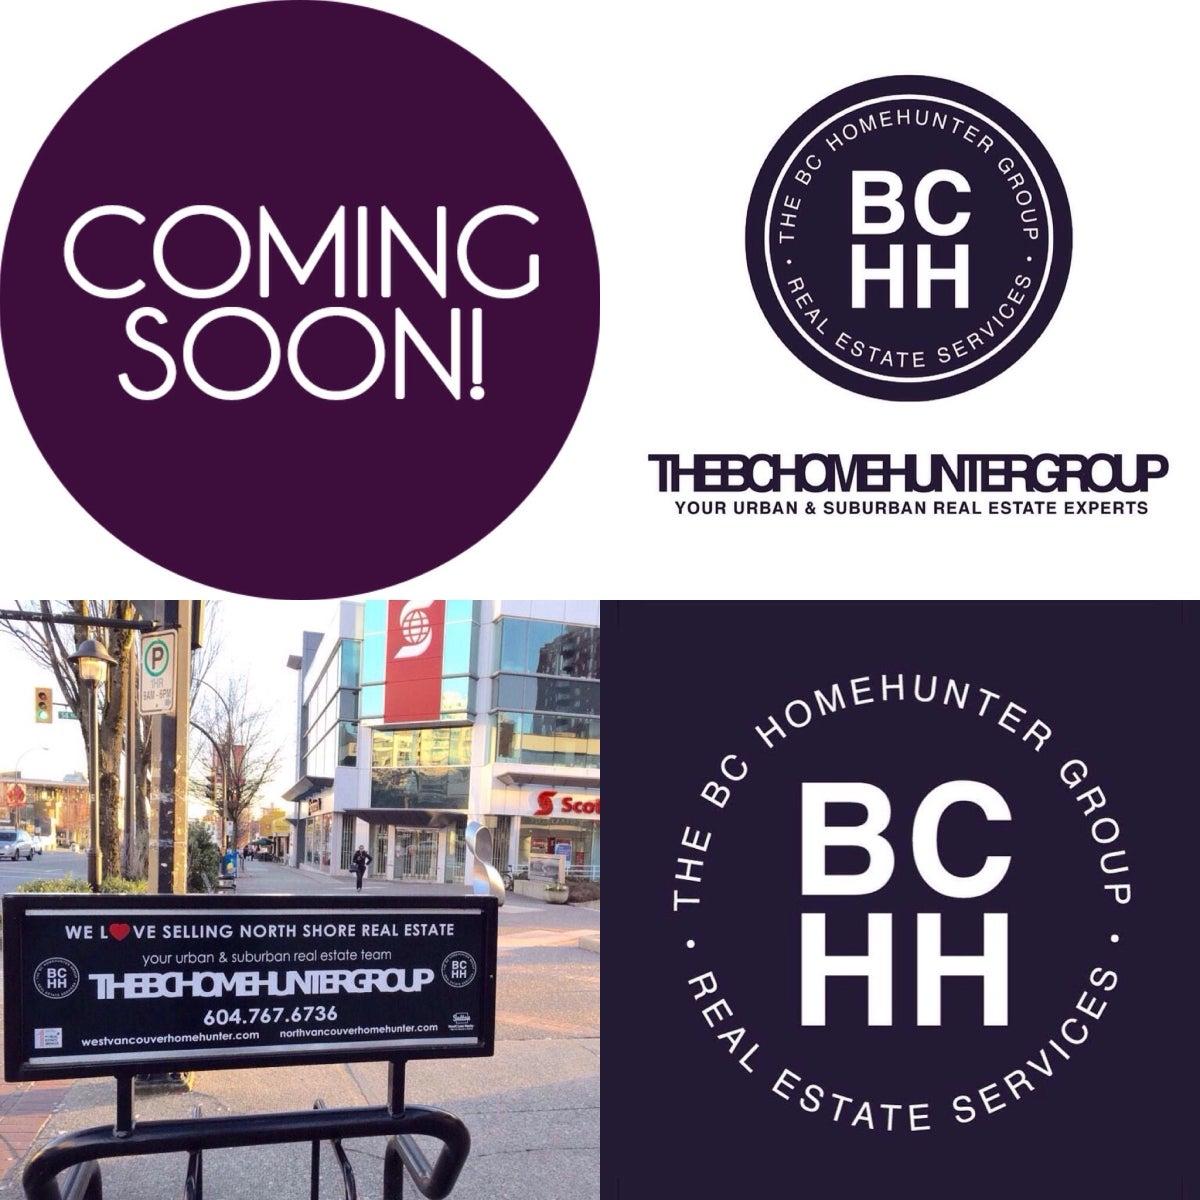 THE BC HOME HUNTER GROUP 604-767-6736 #BCHOMEHUNTER.COM NORTHVANCOUVERHOMEHUNTER